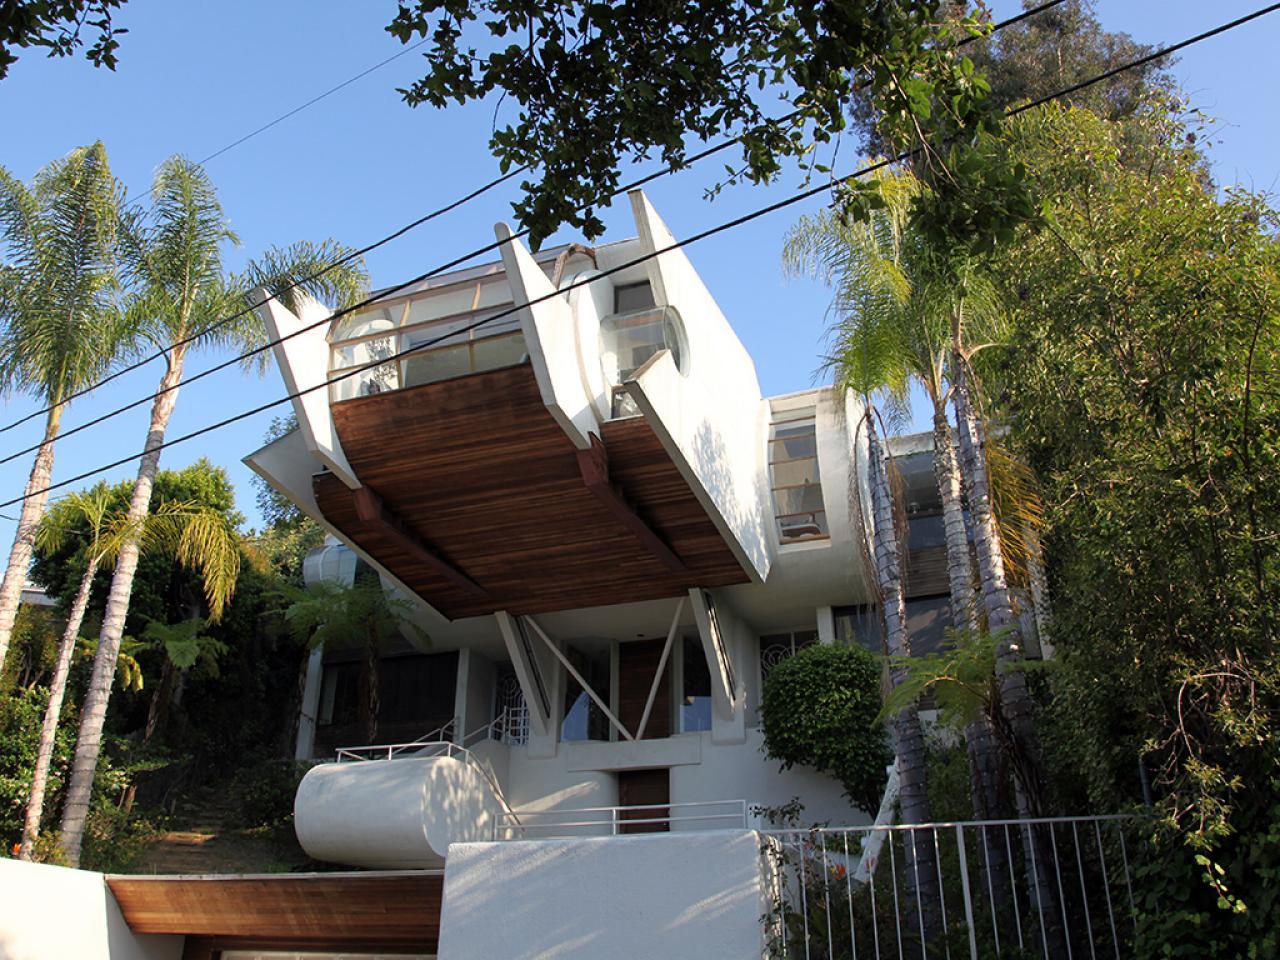 Celebrating the unusual with hgtv 39 s home strange home for Strange home designs